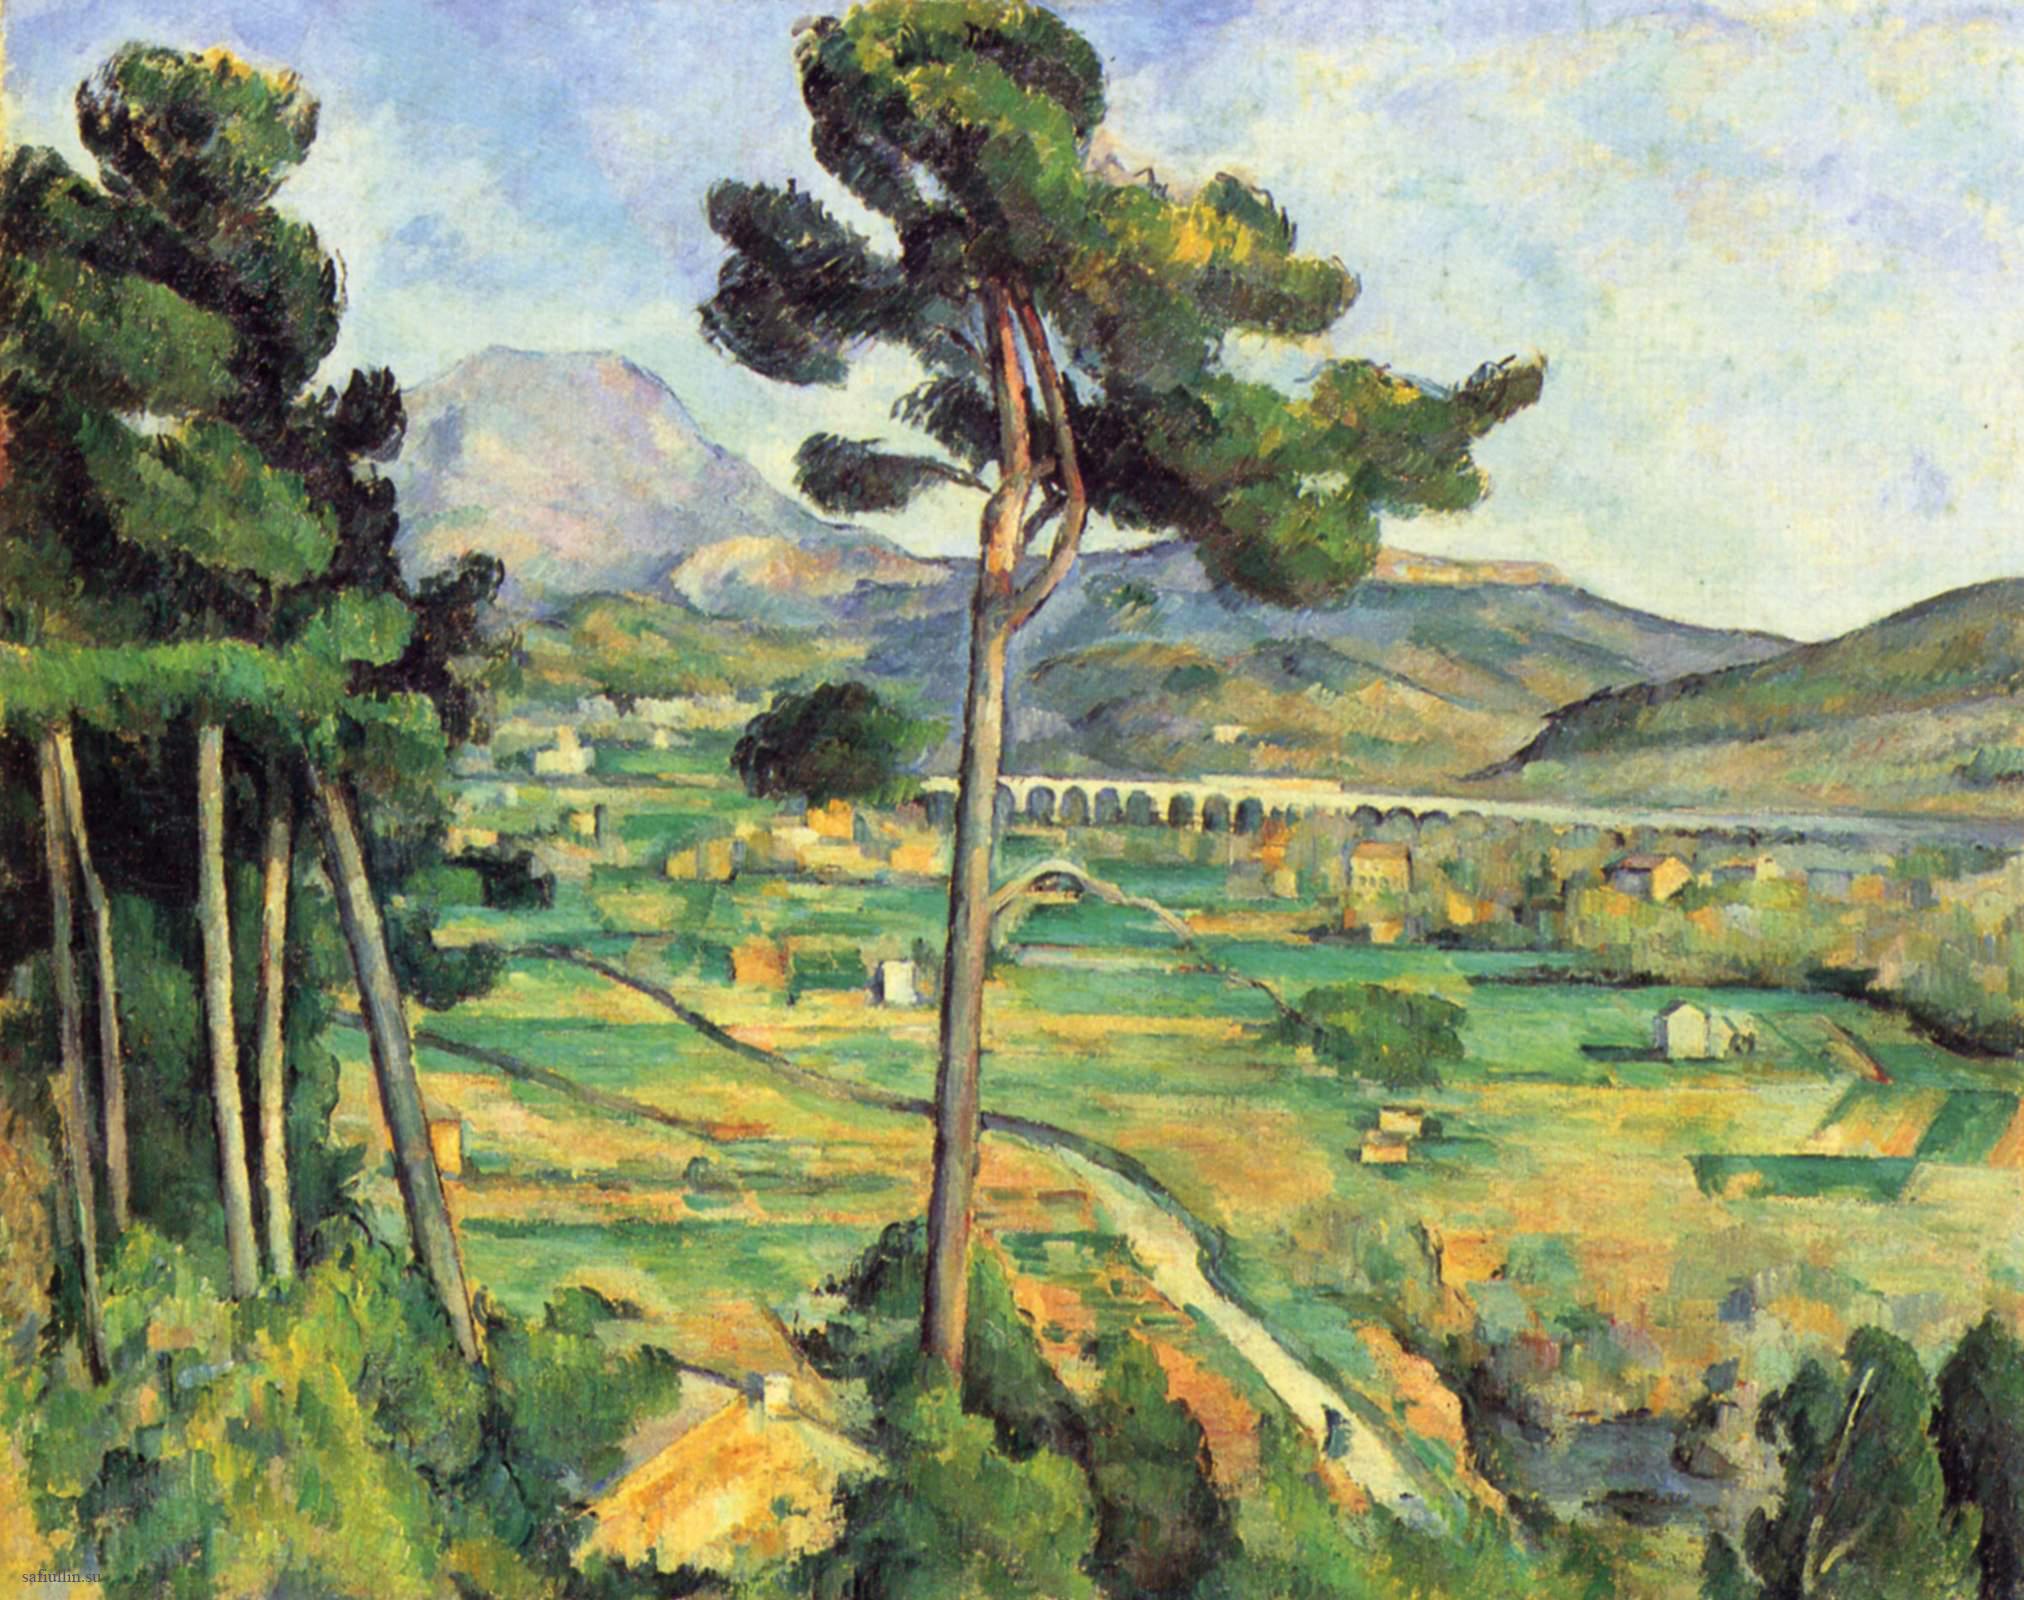 Сезанн картина гора Сент-Виктуар 1882 пейзажи природы Сафиуллин